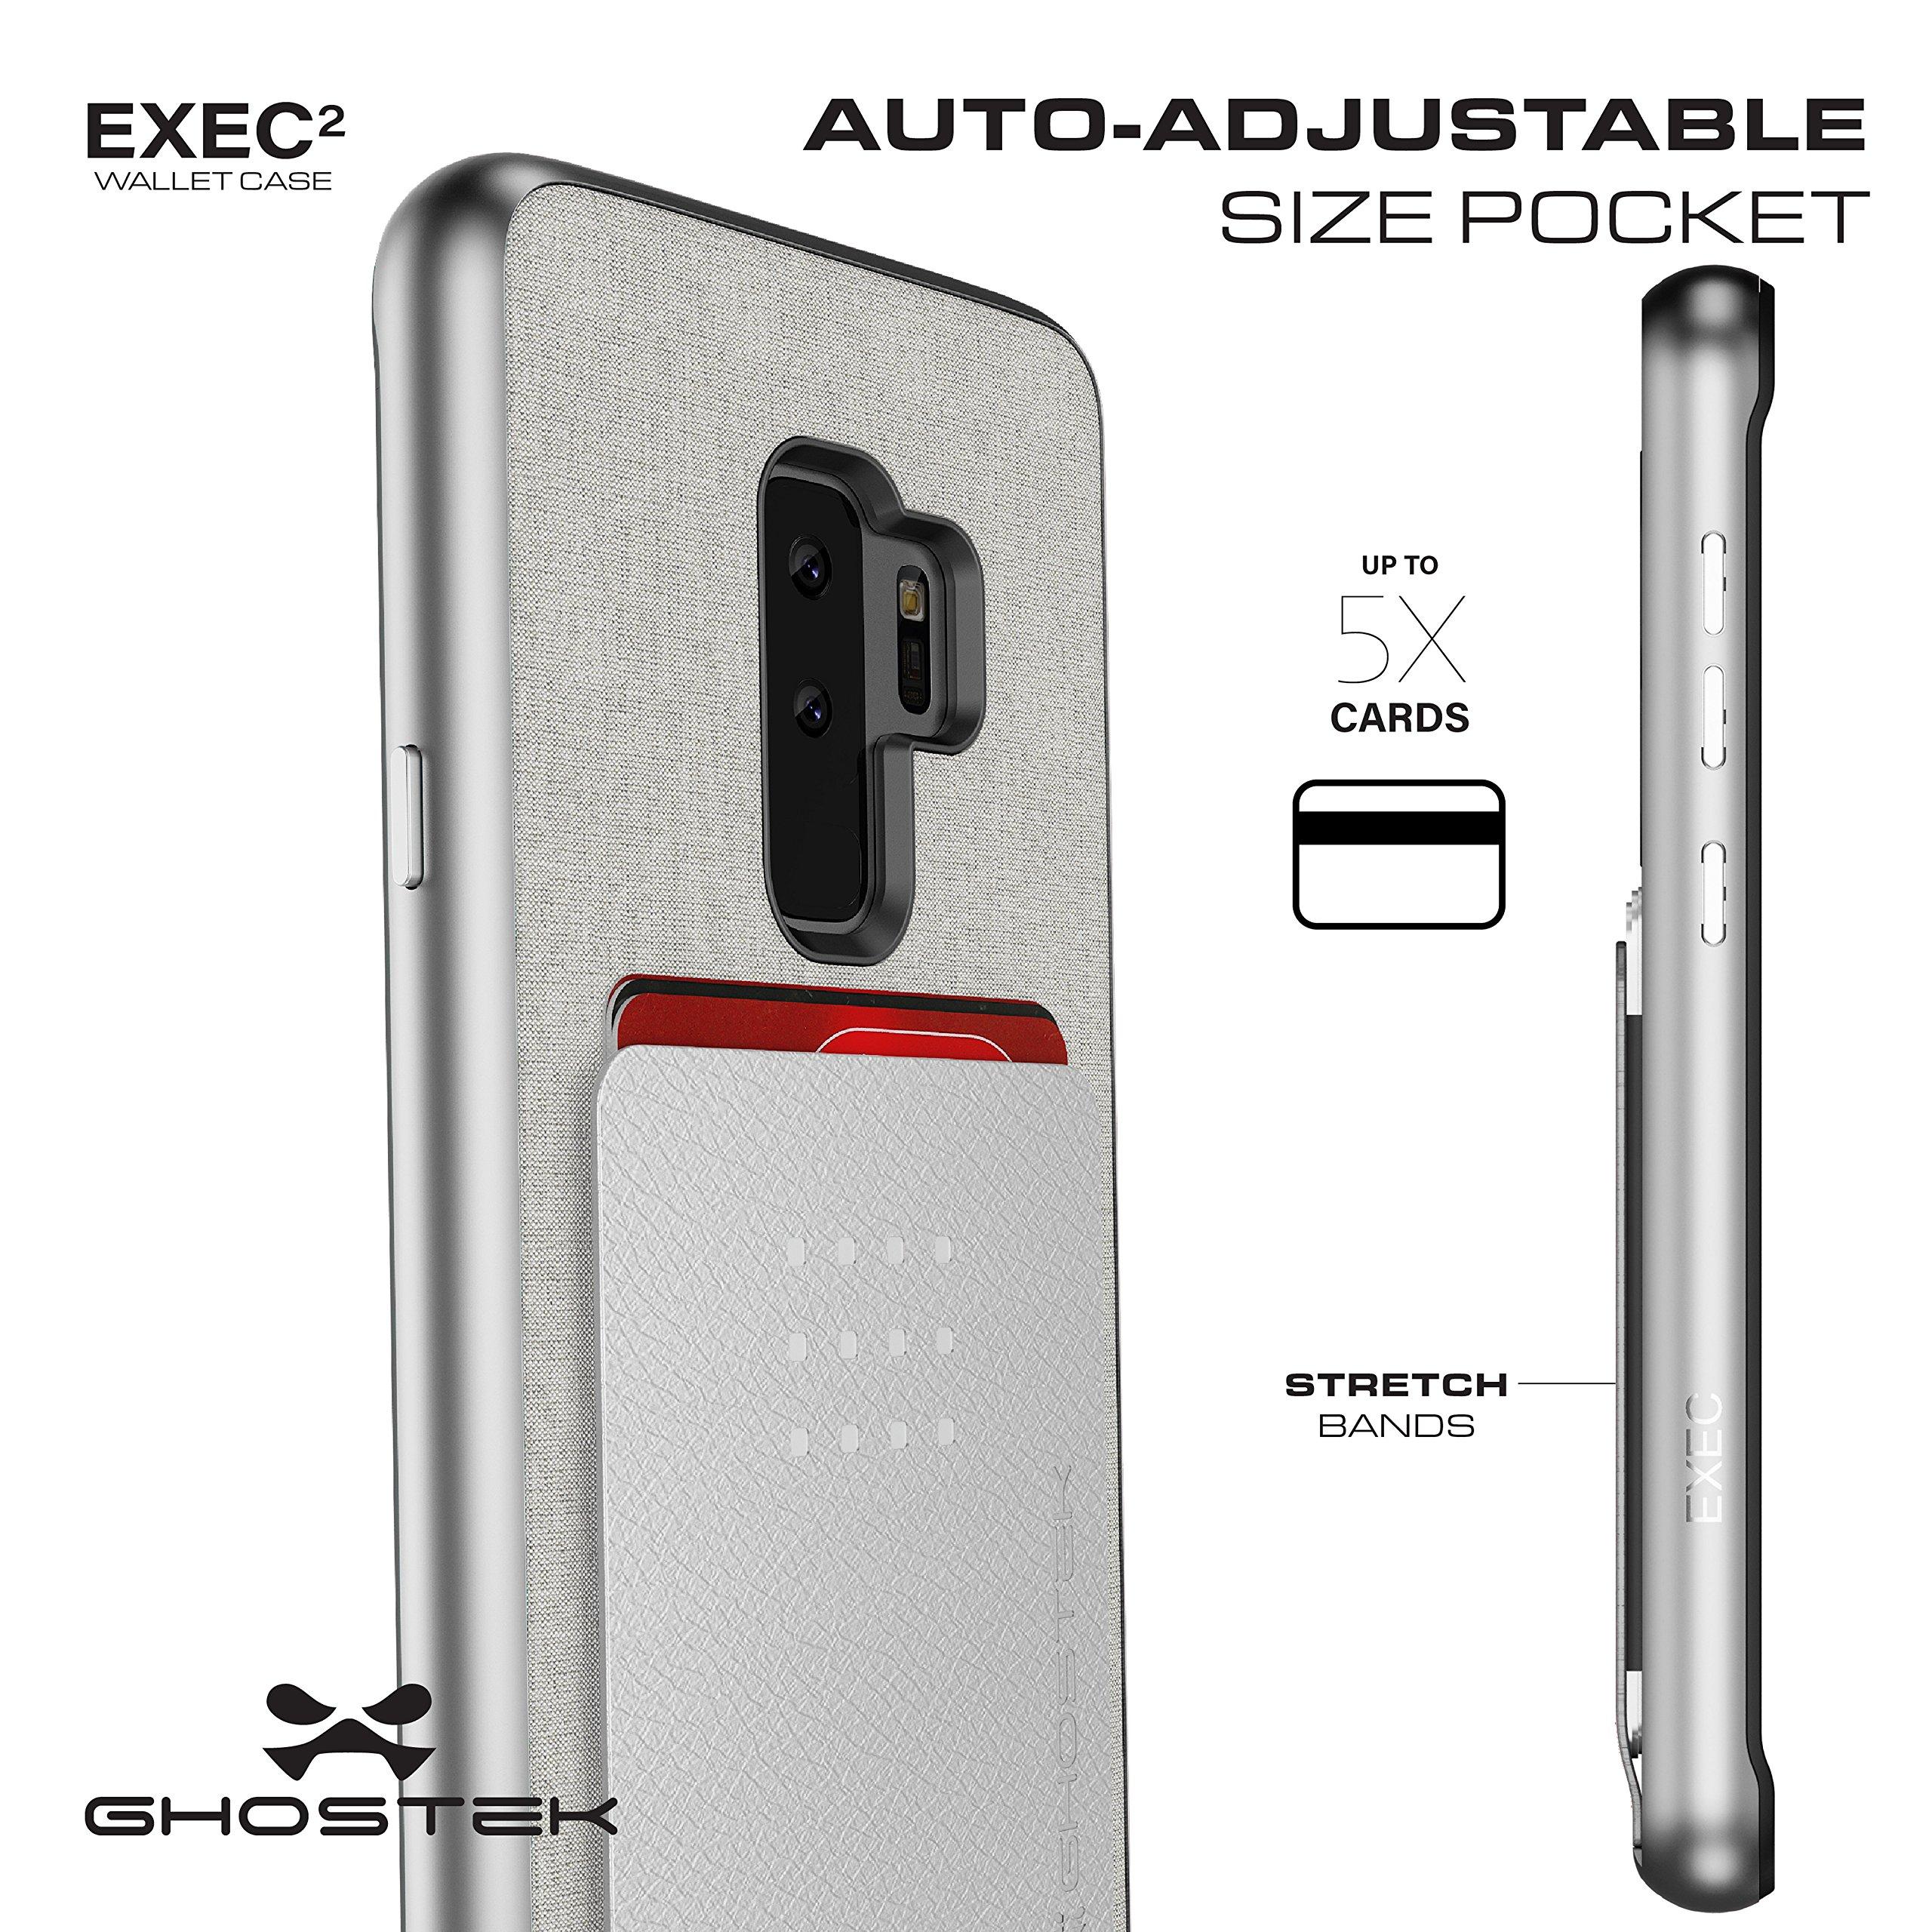 finest selection 6a4eb c21c5 Ghostek Galaxy S9 Plus S9+ Wallet Case - Unboxed